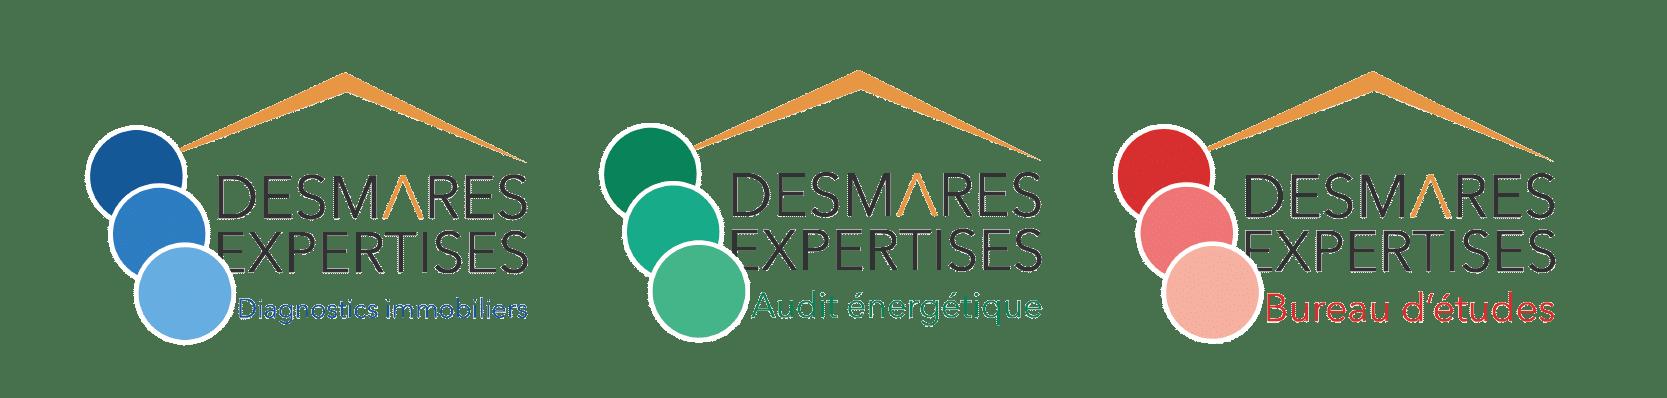 ACTIVITE DESMARES EXPERTISES LOGO